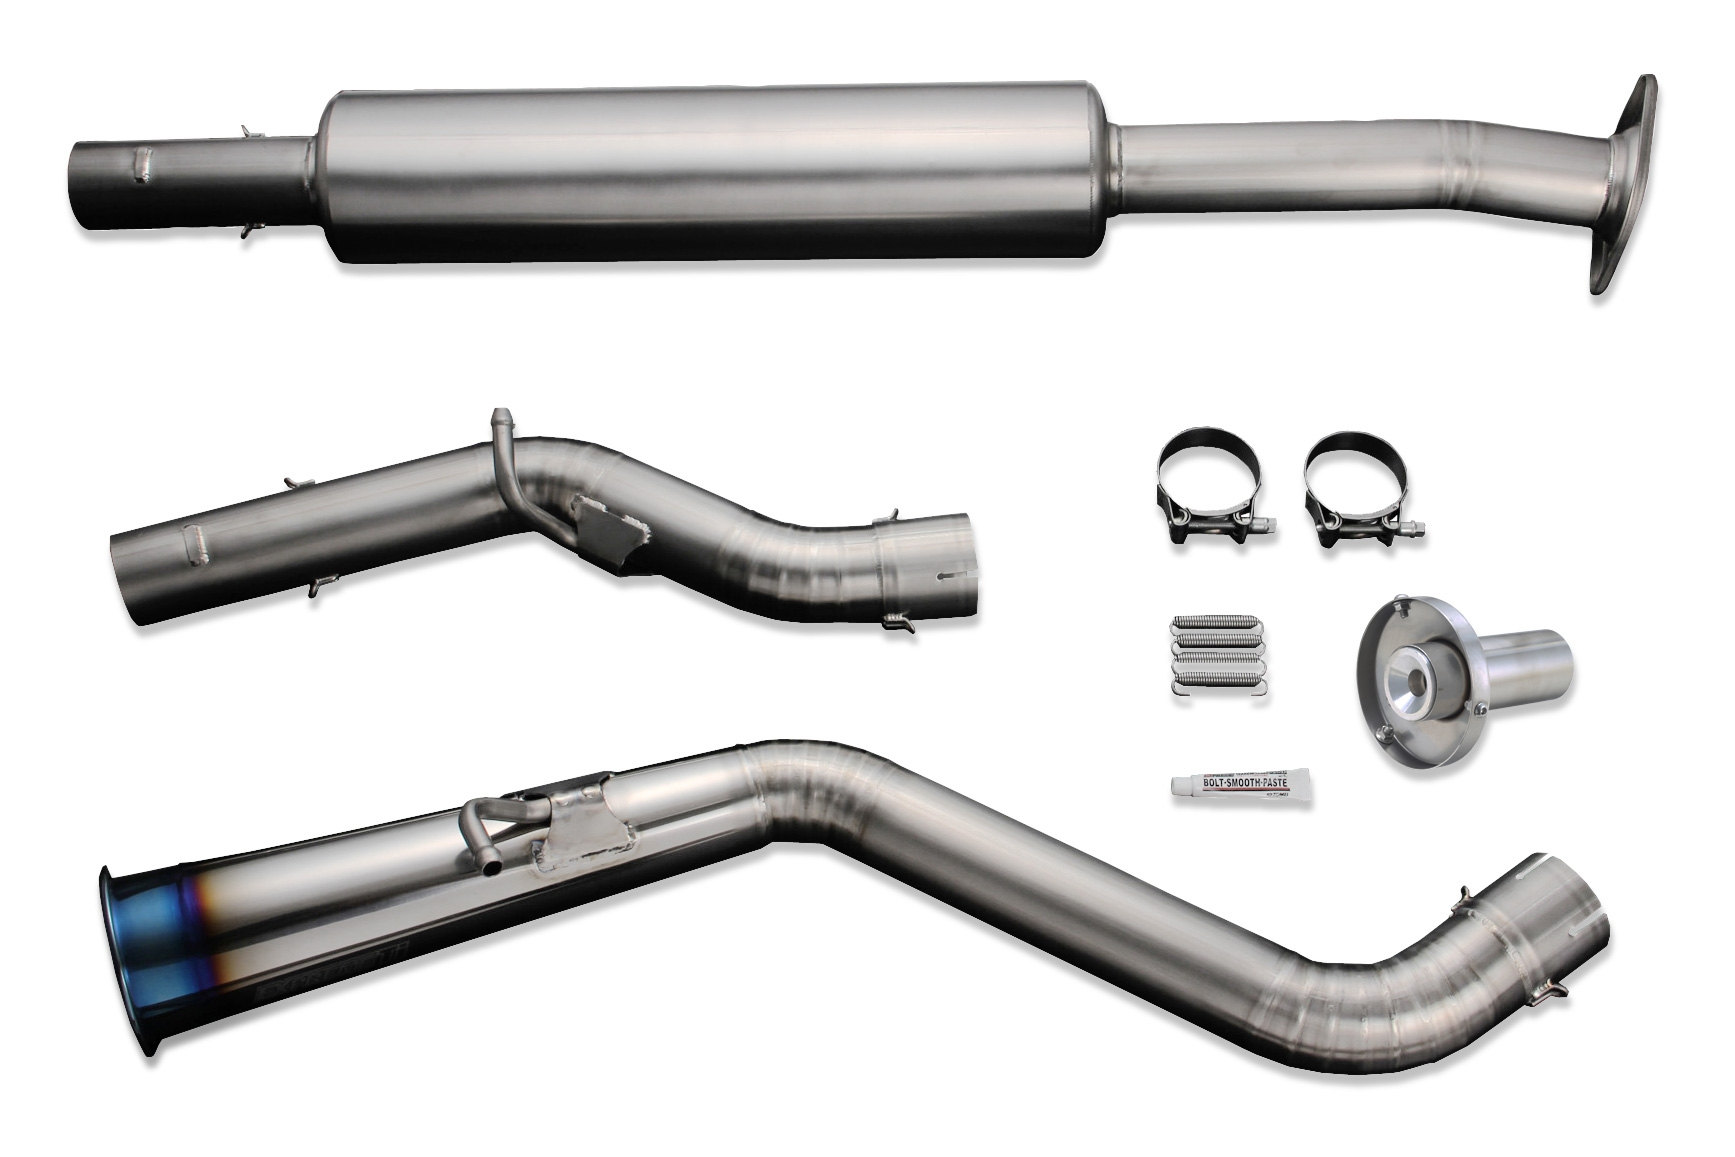 tomei expreme ti full titanium cat back exhaust system type 60r scion fr s 13 subaru brz 13 toyota 86 17 zn6 zc6 tb6090 sb03b concept z